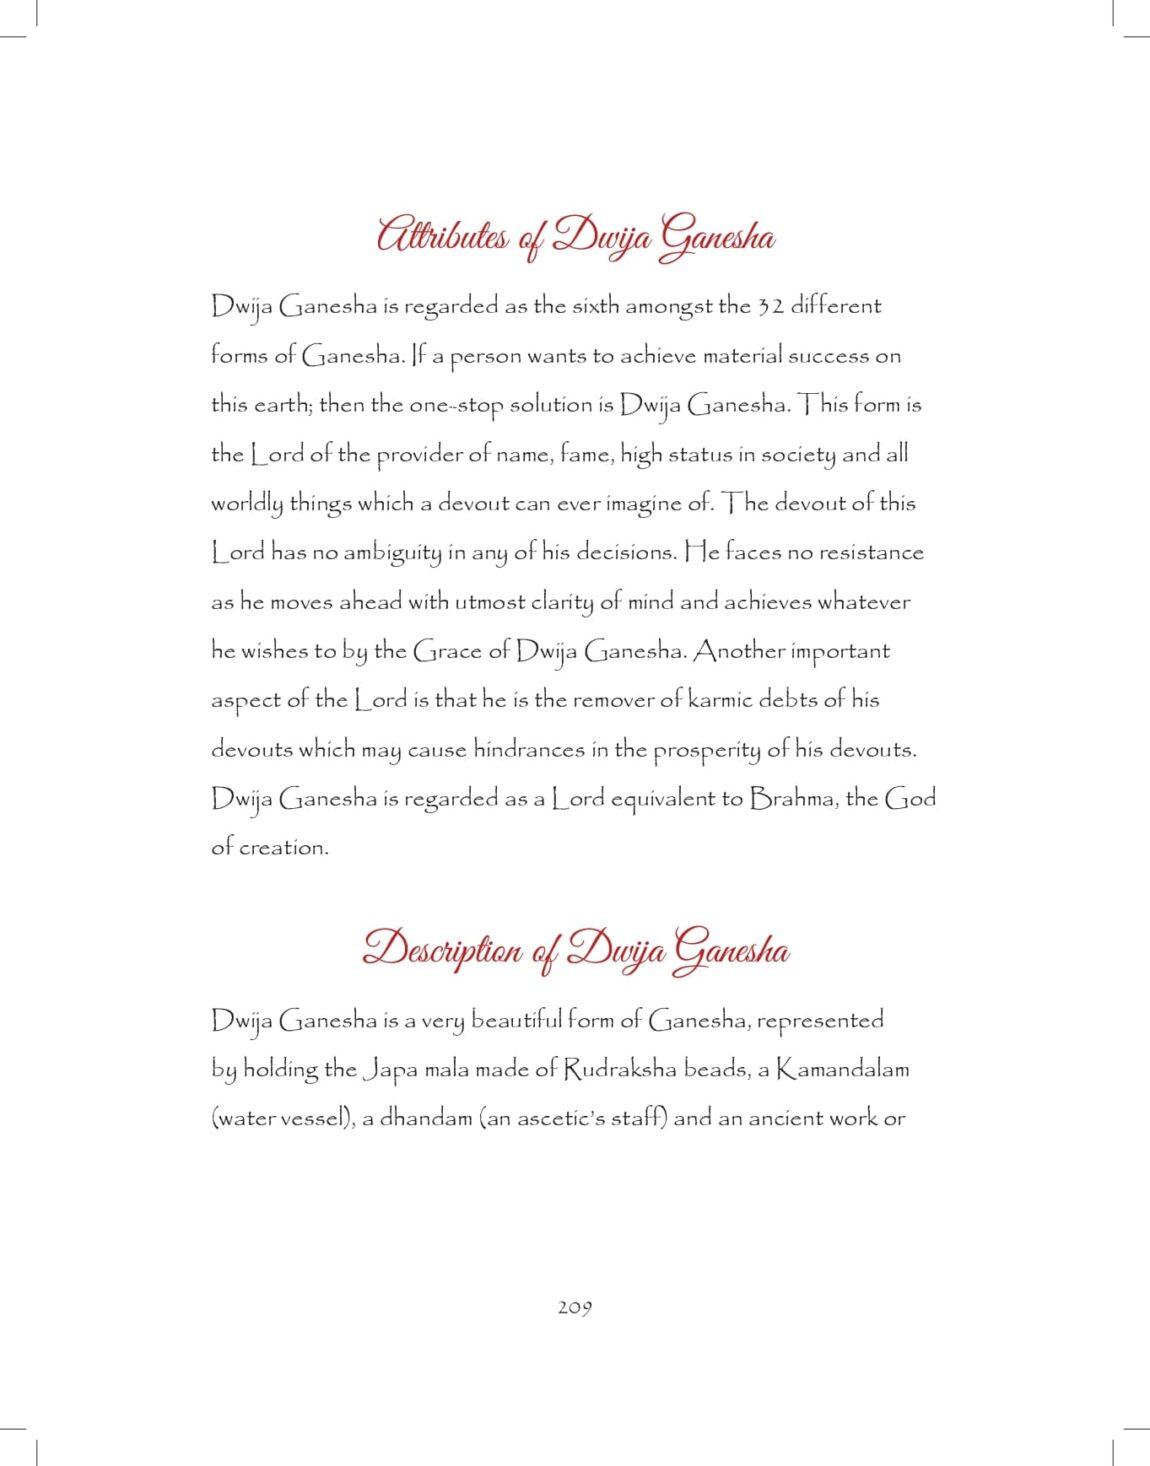 Ganesh-print_pages-to-jpg-0209.jpg